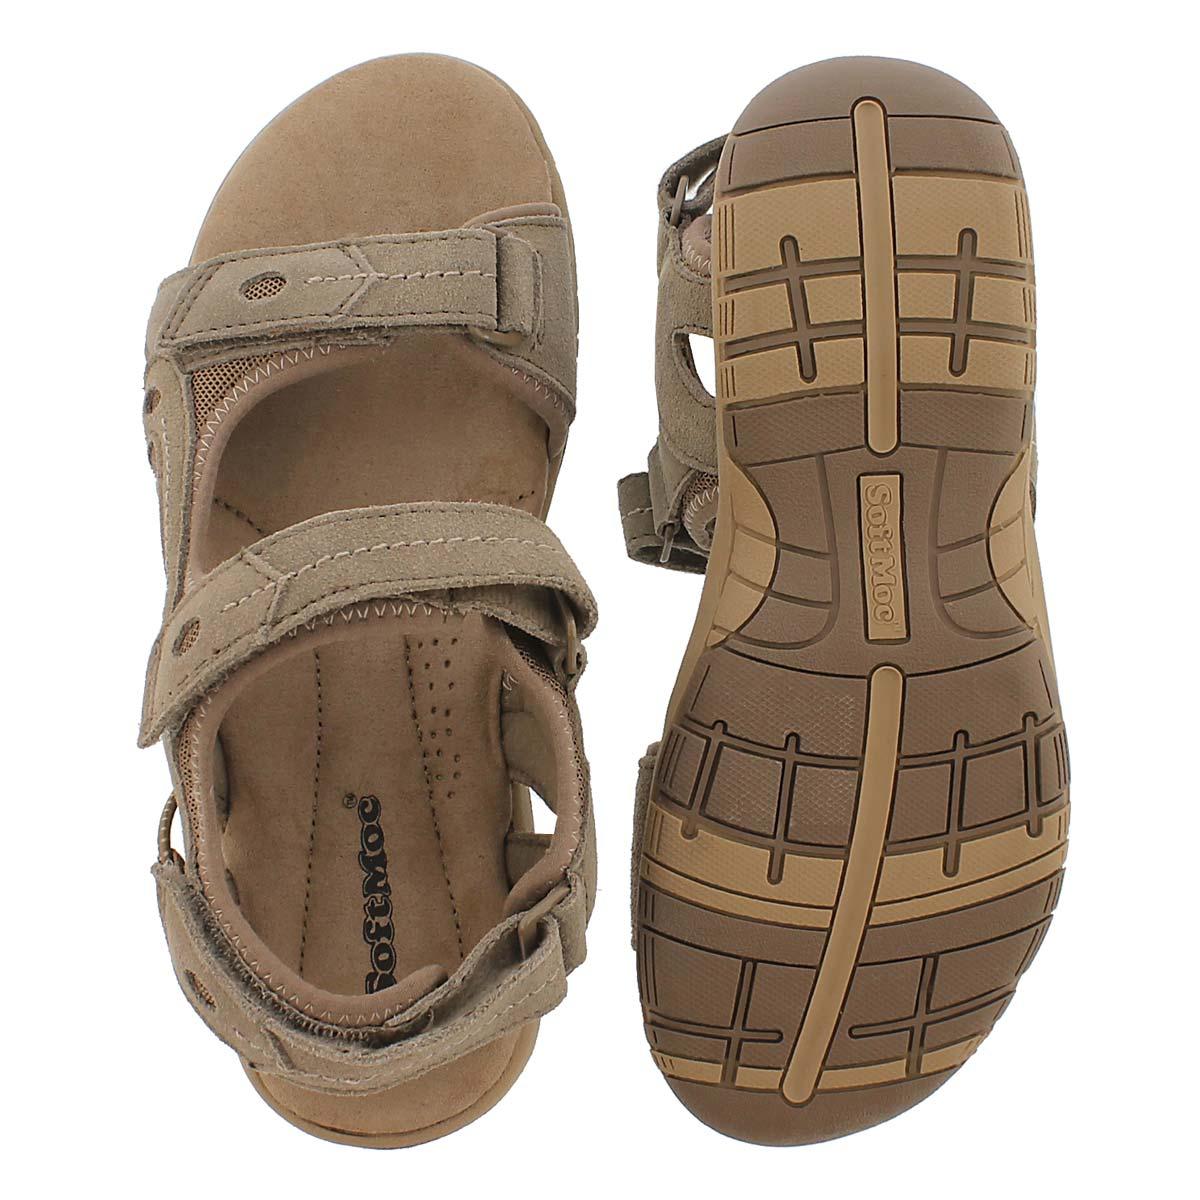 Lds Gladys brn 3-strap mem. foam sandal